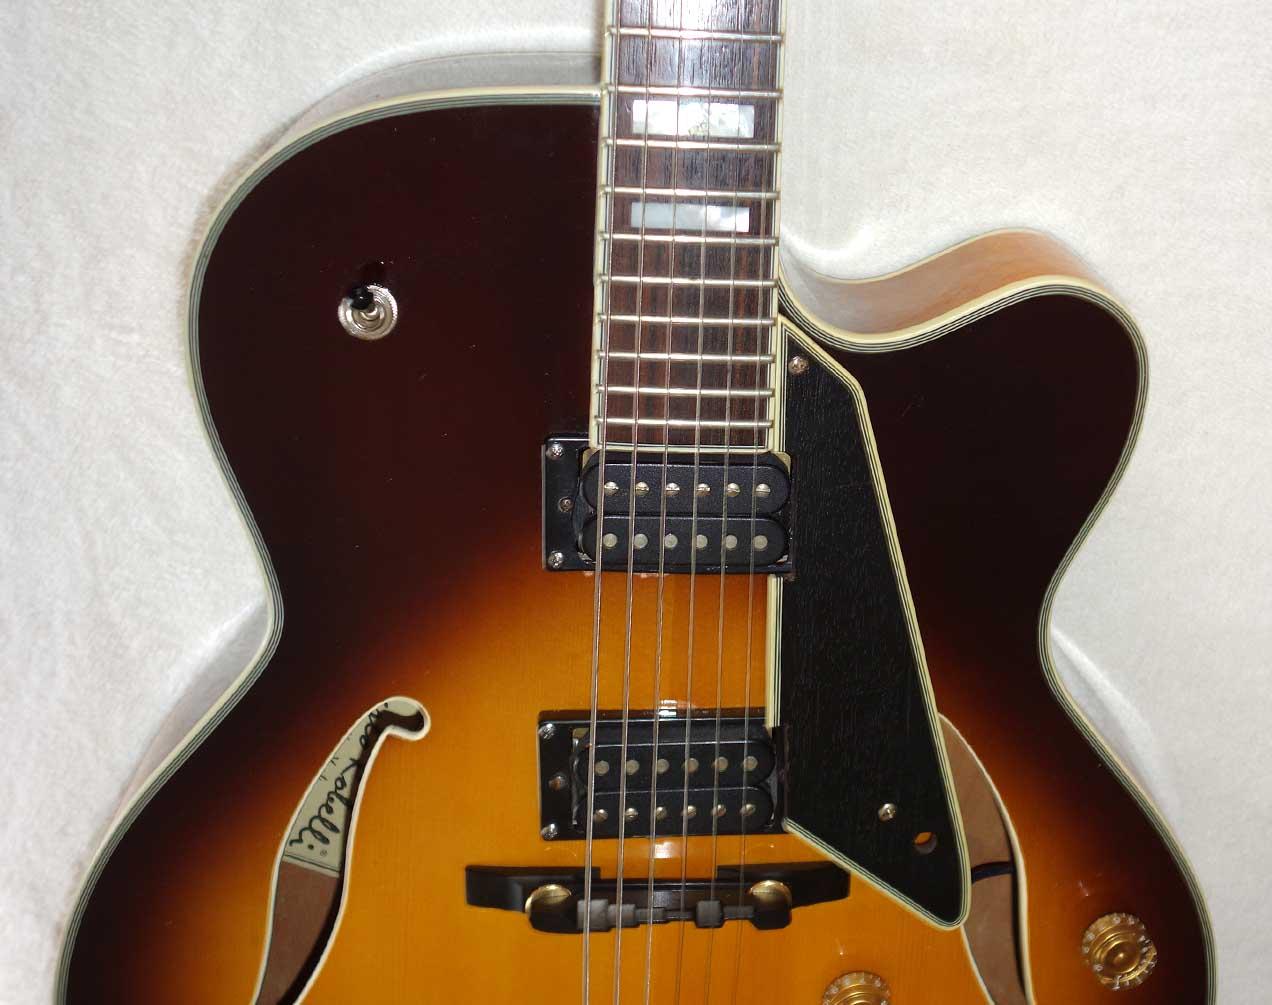 2003 Carlo Robelli D120 Manhattan (Peerless Monarch) Sunburst Archtop Guitar w/Schaller PUPs!!